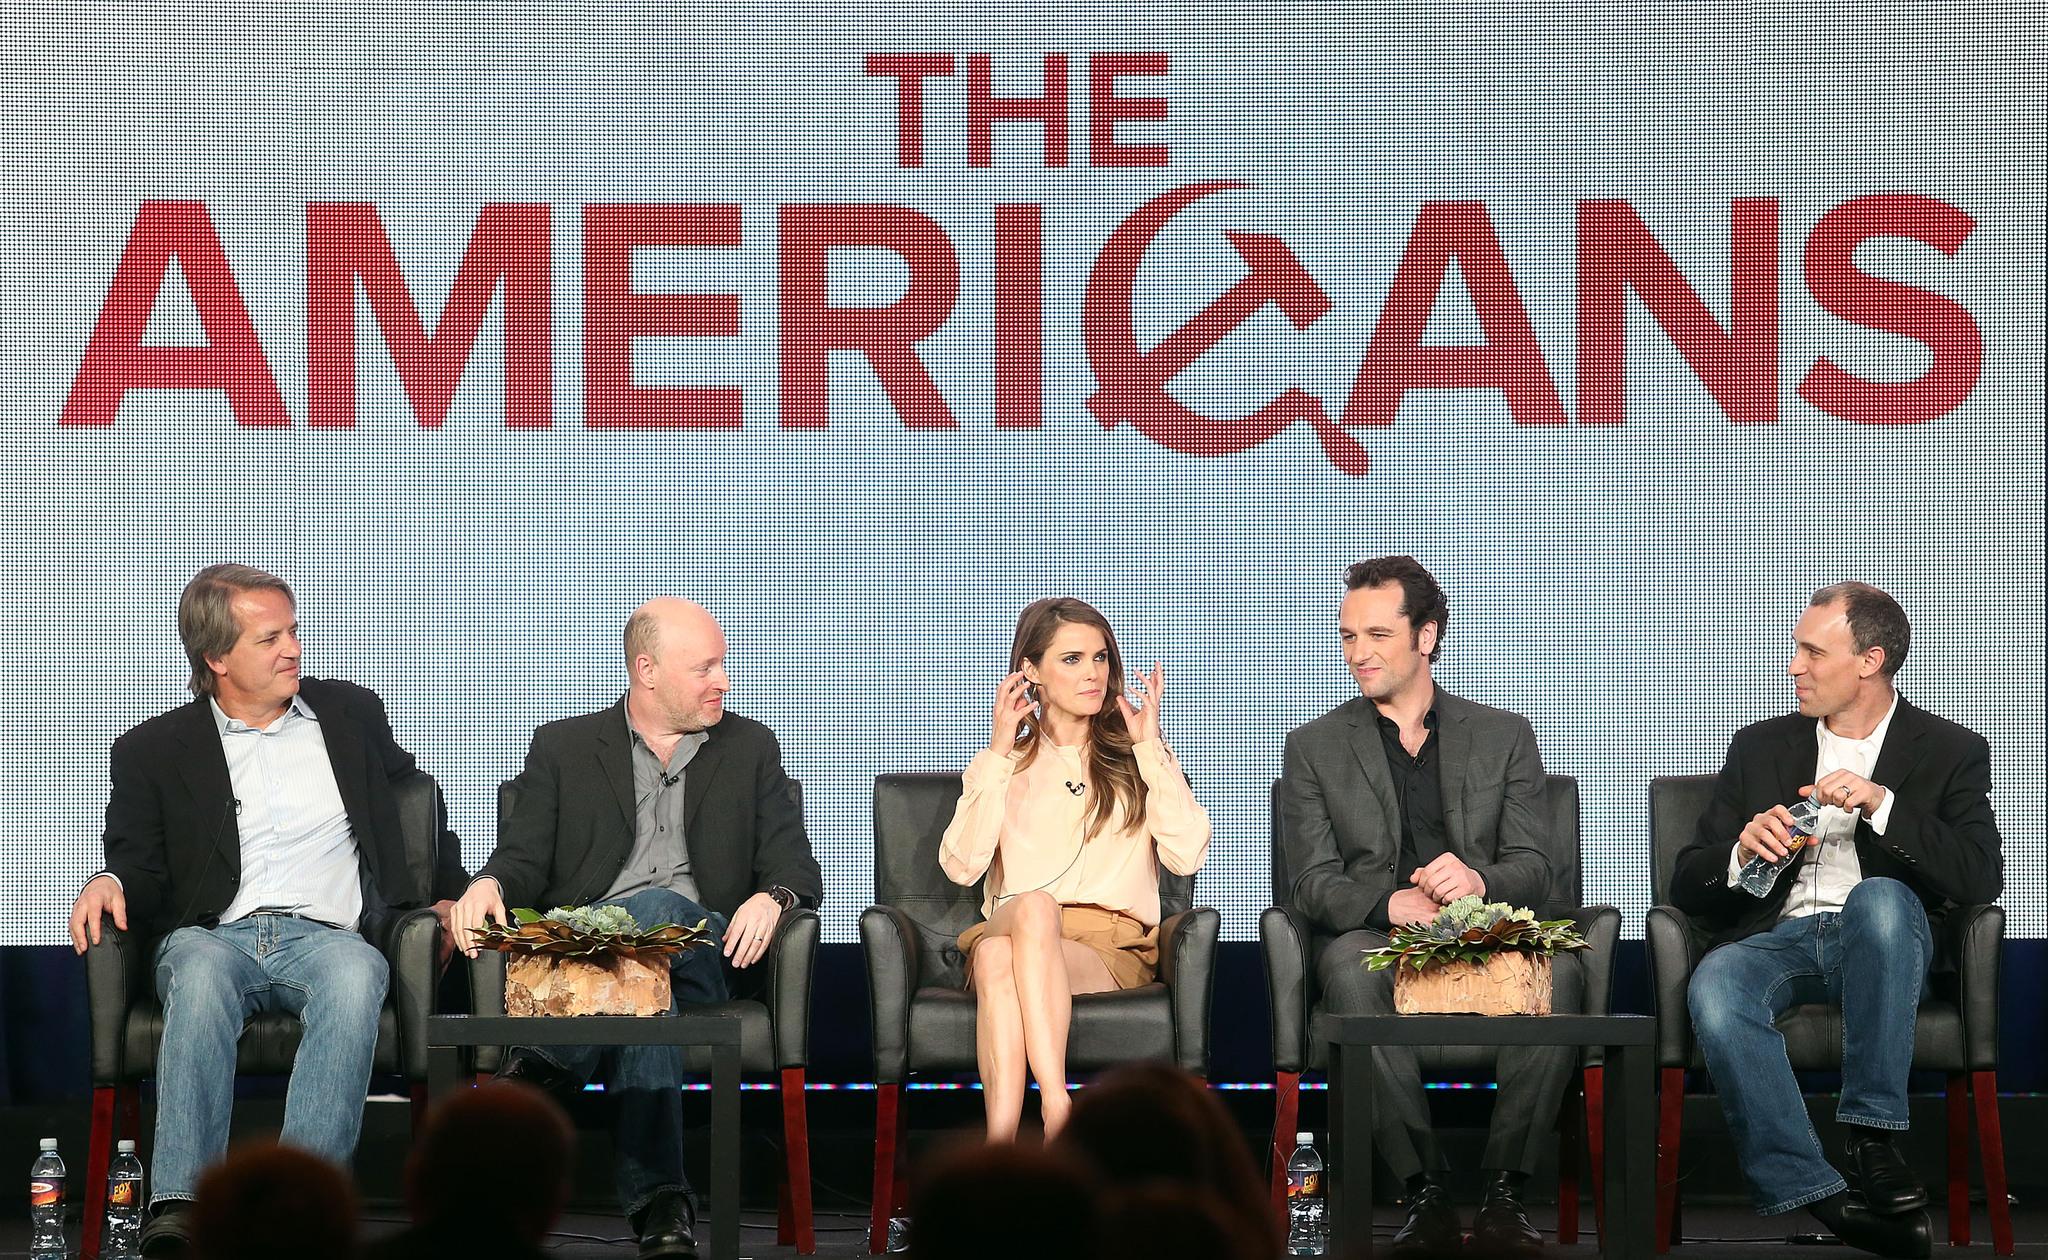 Graham Yost, Keri Russell, Joel Fields, Matthew Rhys, and Joseph Weisberg at an event for The Americans (2013)